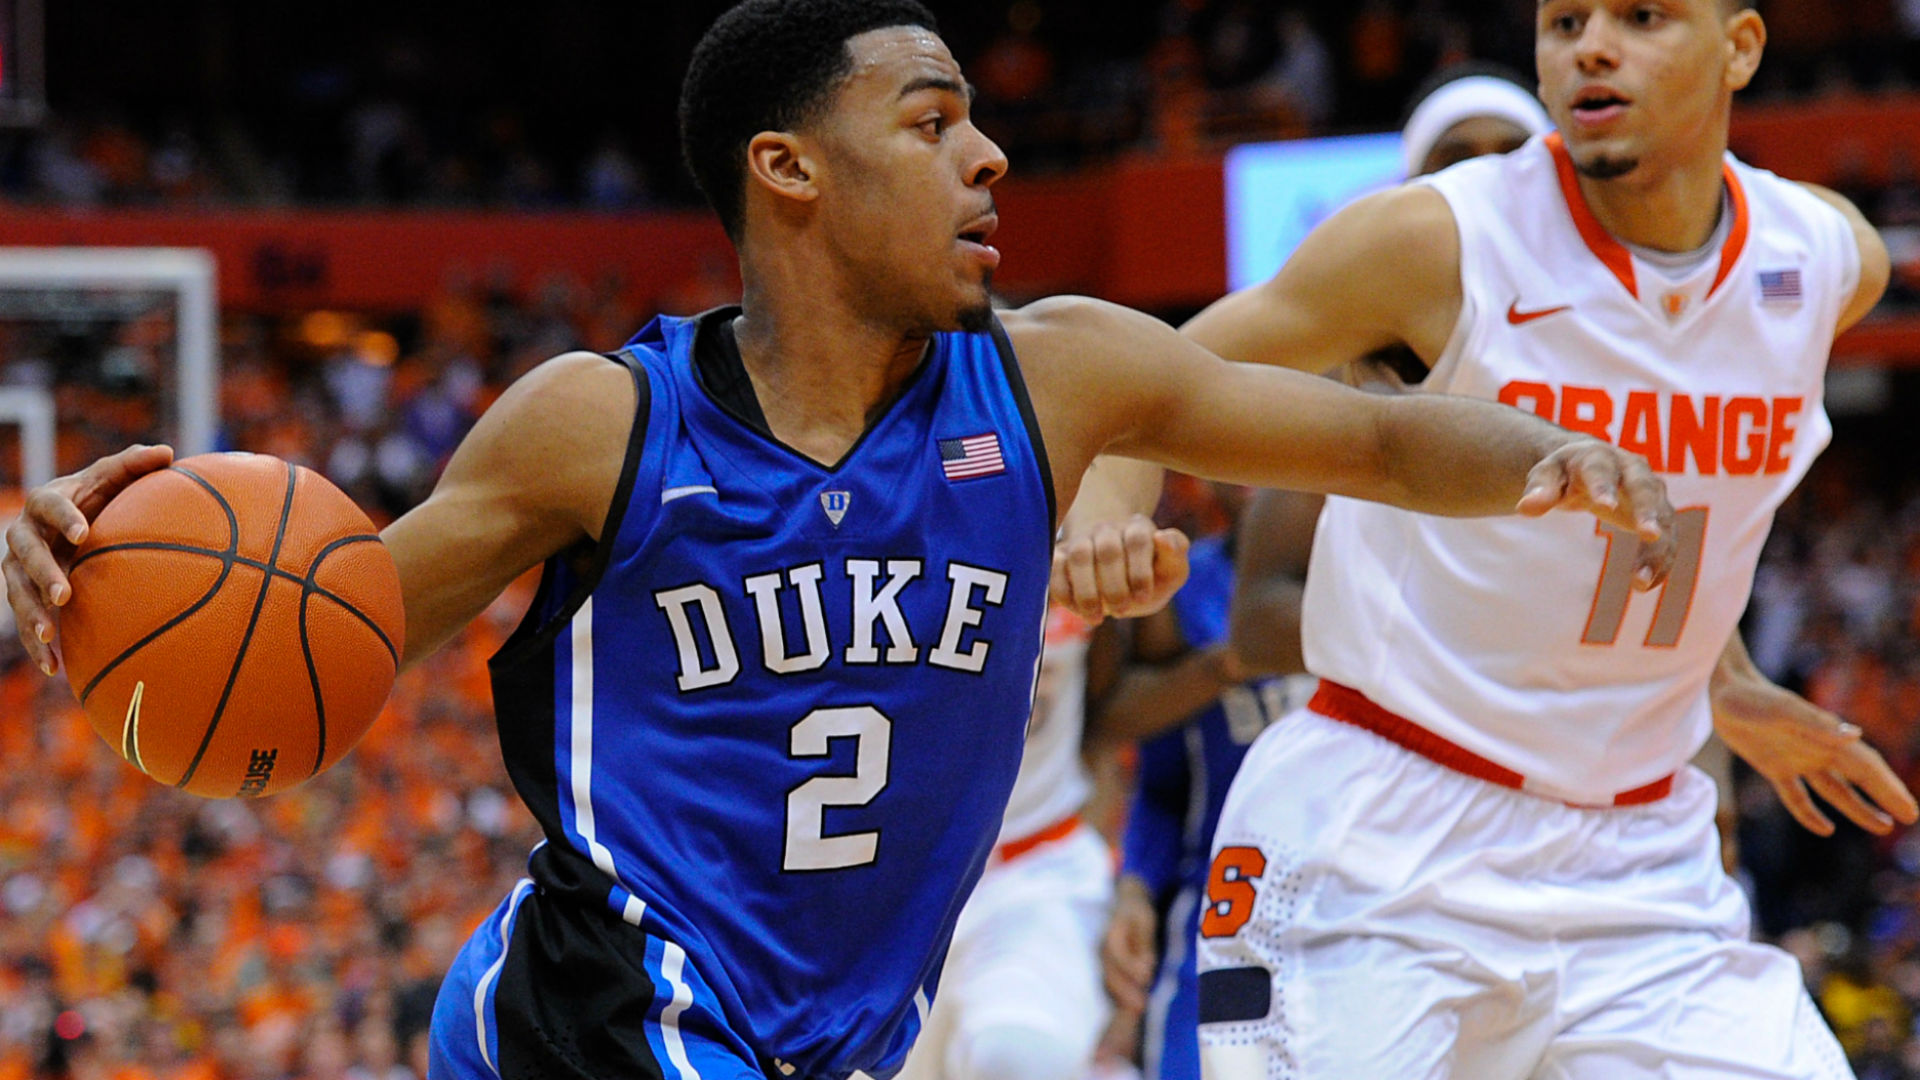 NCAA Tournament odds - Kentucky well ahead of second favorite Duke